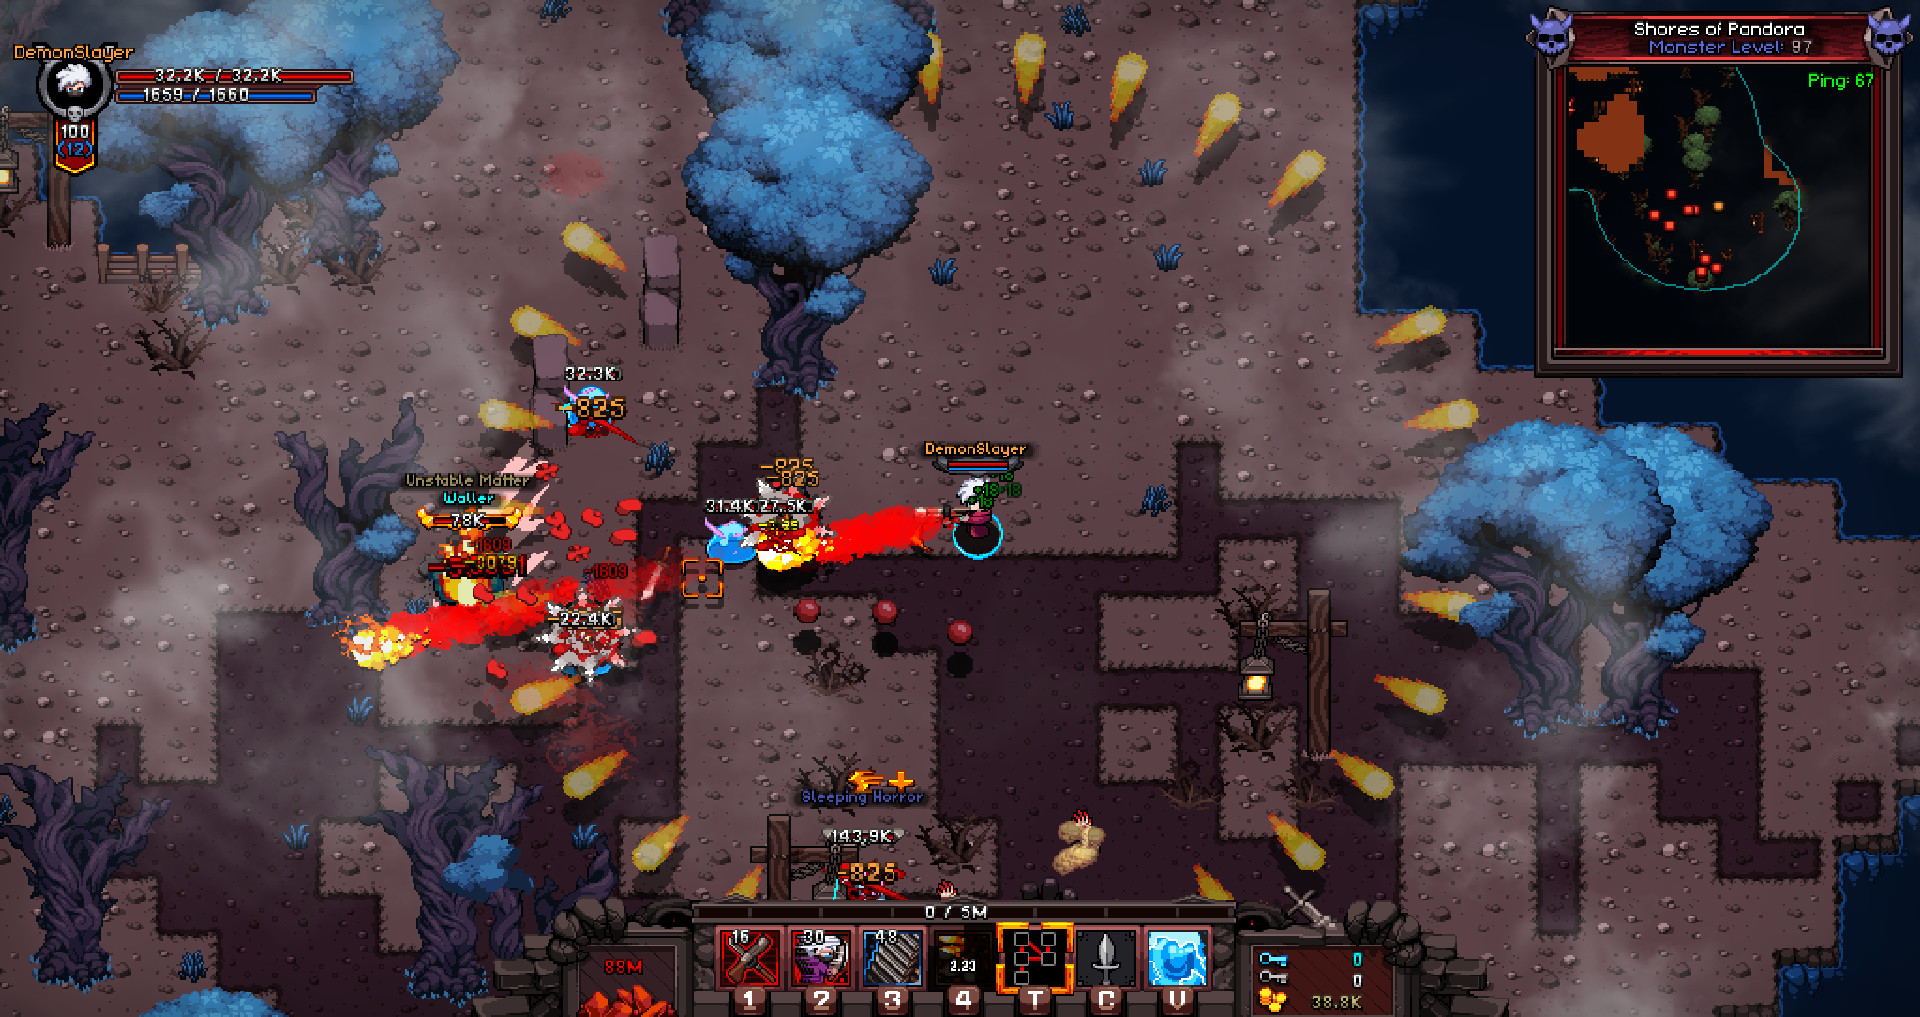 hero-siege-pc-screenshot-2